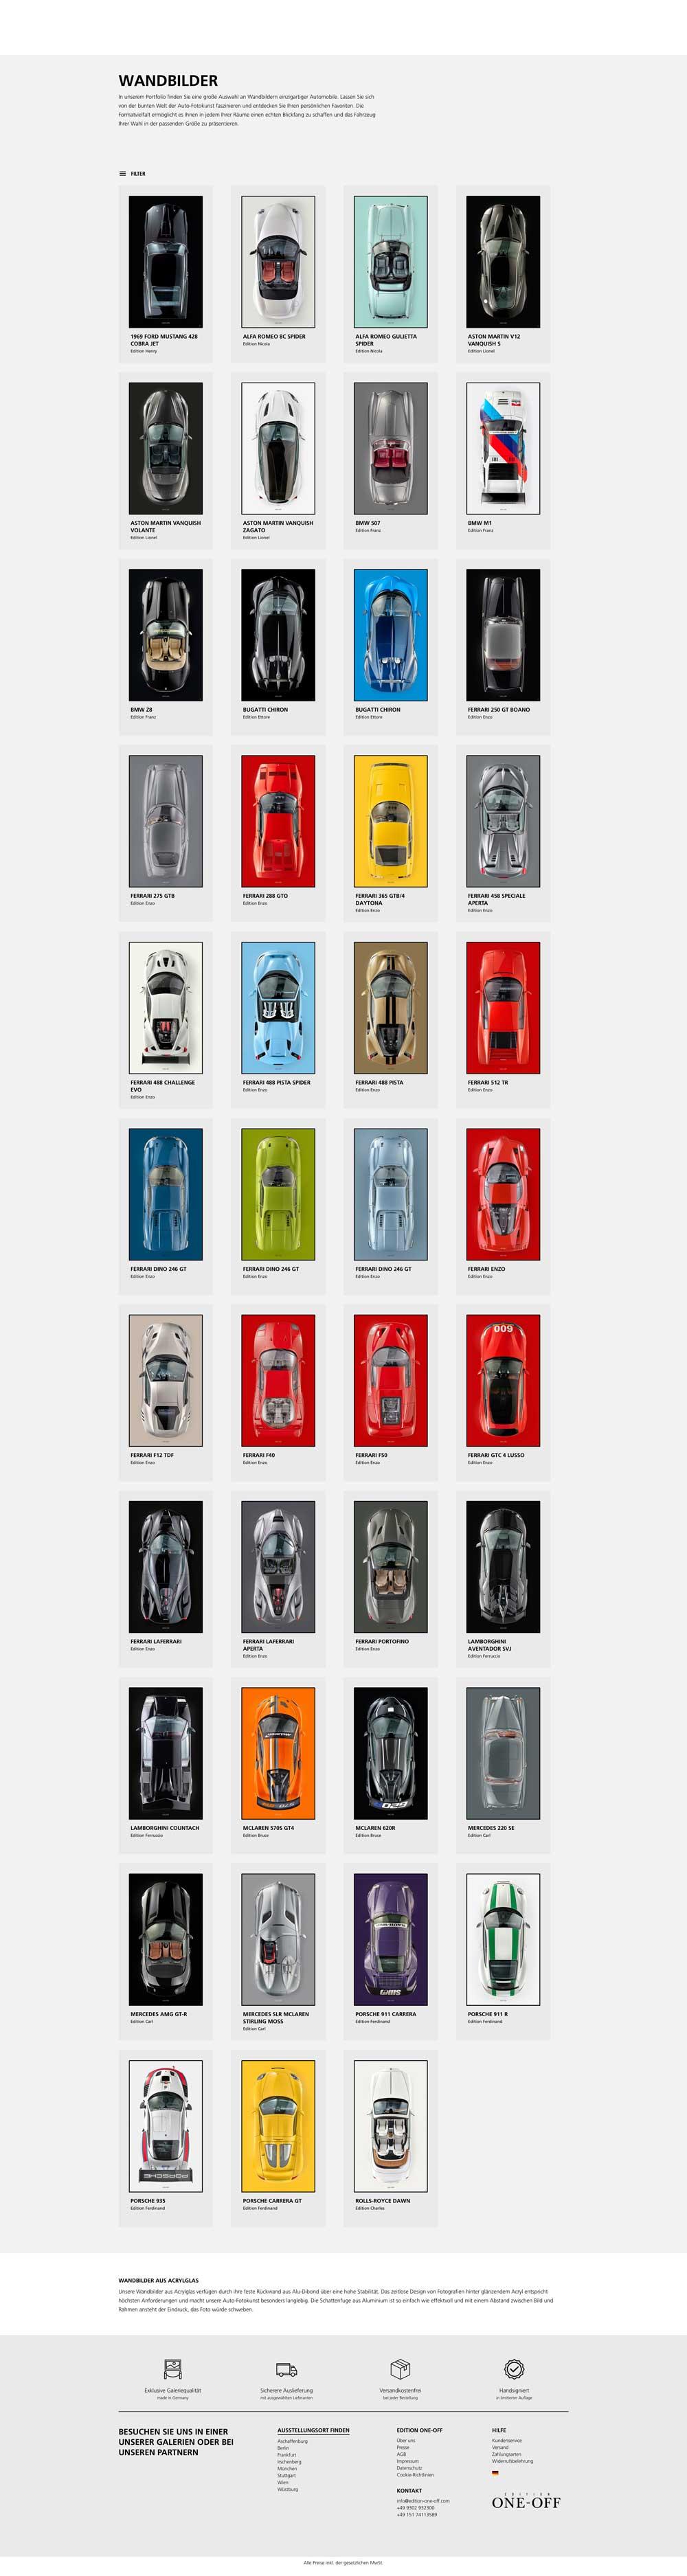 Scuderia GT: Wandbilder - EDITION ONE-OFF